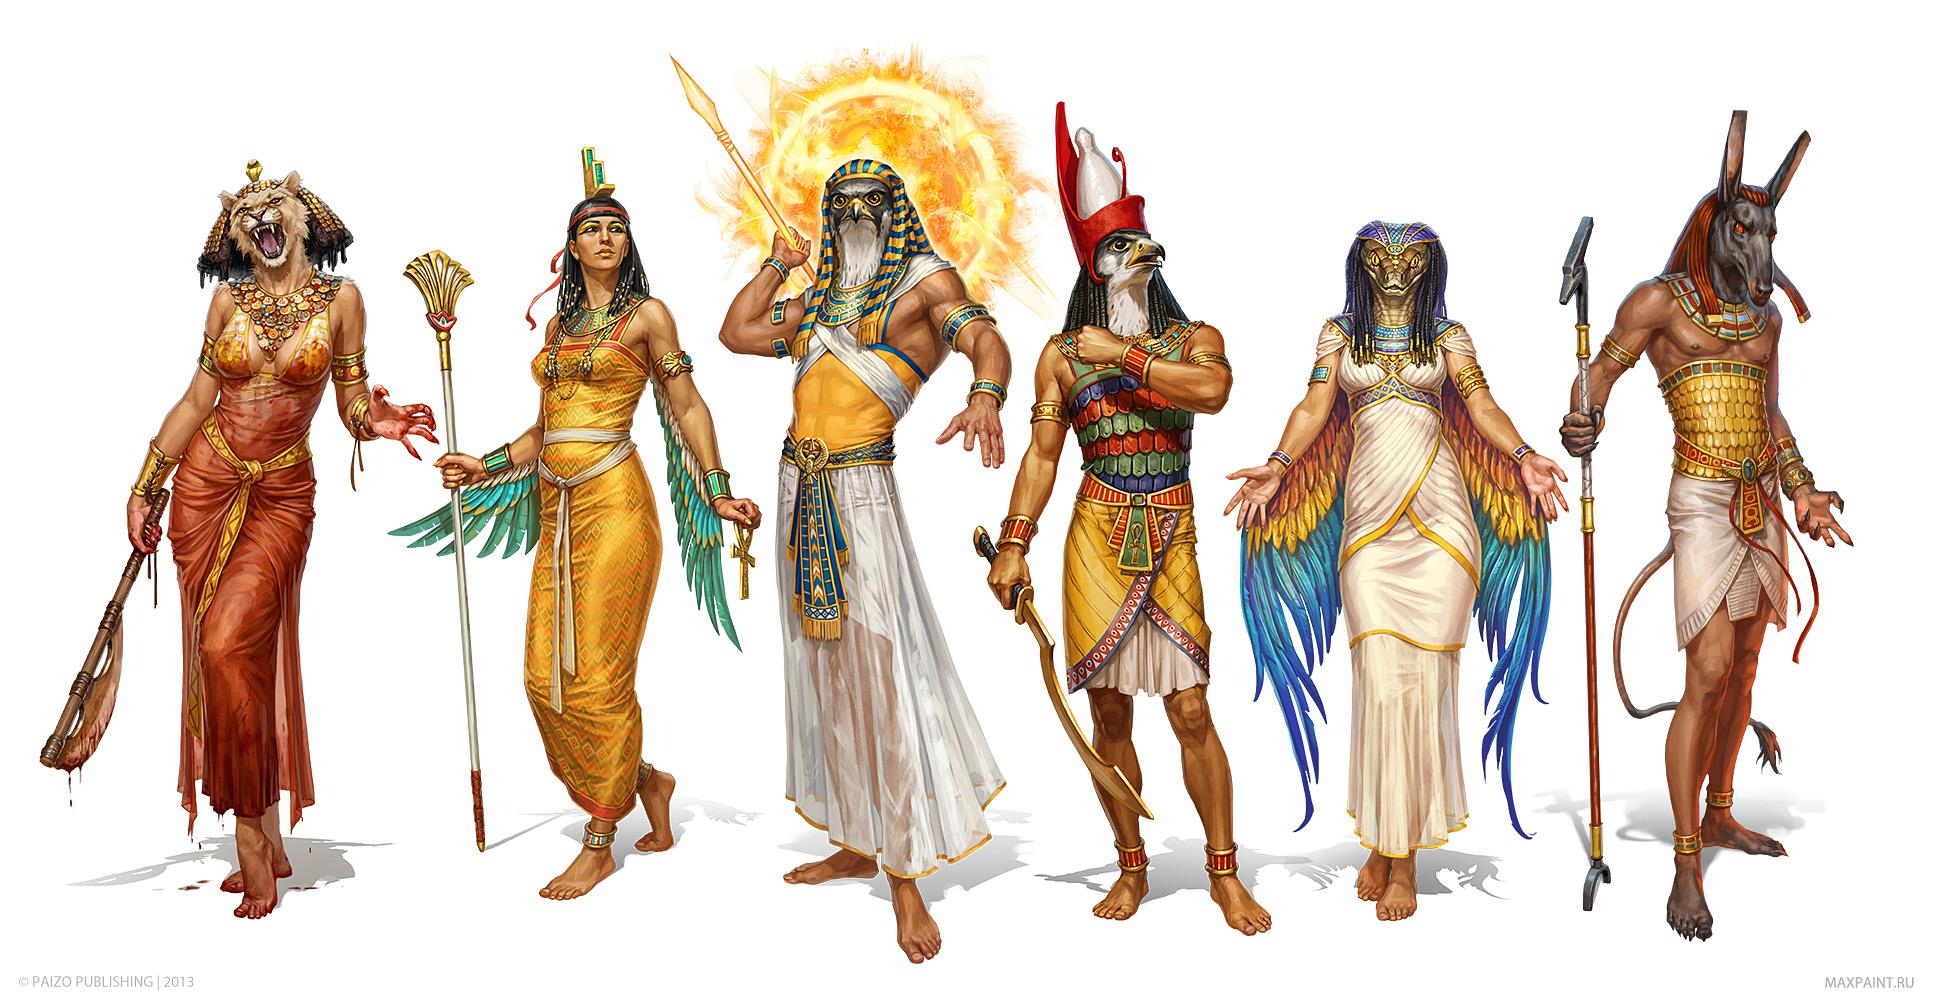 egiptian deities Le divinità Egizie (Sekhmet, Isis, Ra, Horus, Wedjet e Set) - by Ekaterina Burmak Pathfinder Adventure Path #80 - Mummy's Mask pt.2, Empty Graves (2014) © PAIZO Publishing